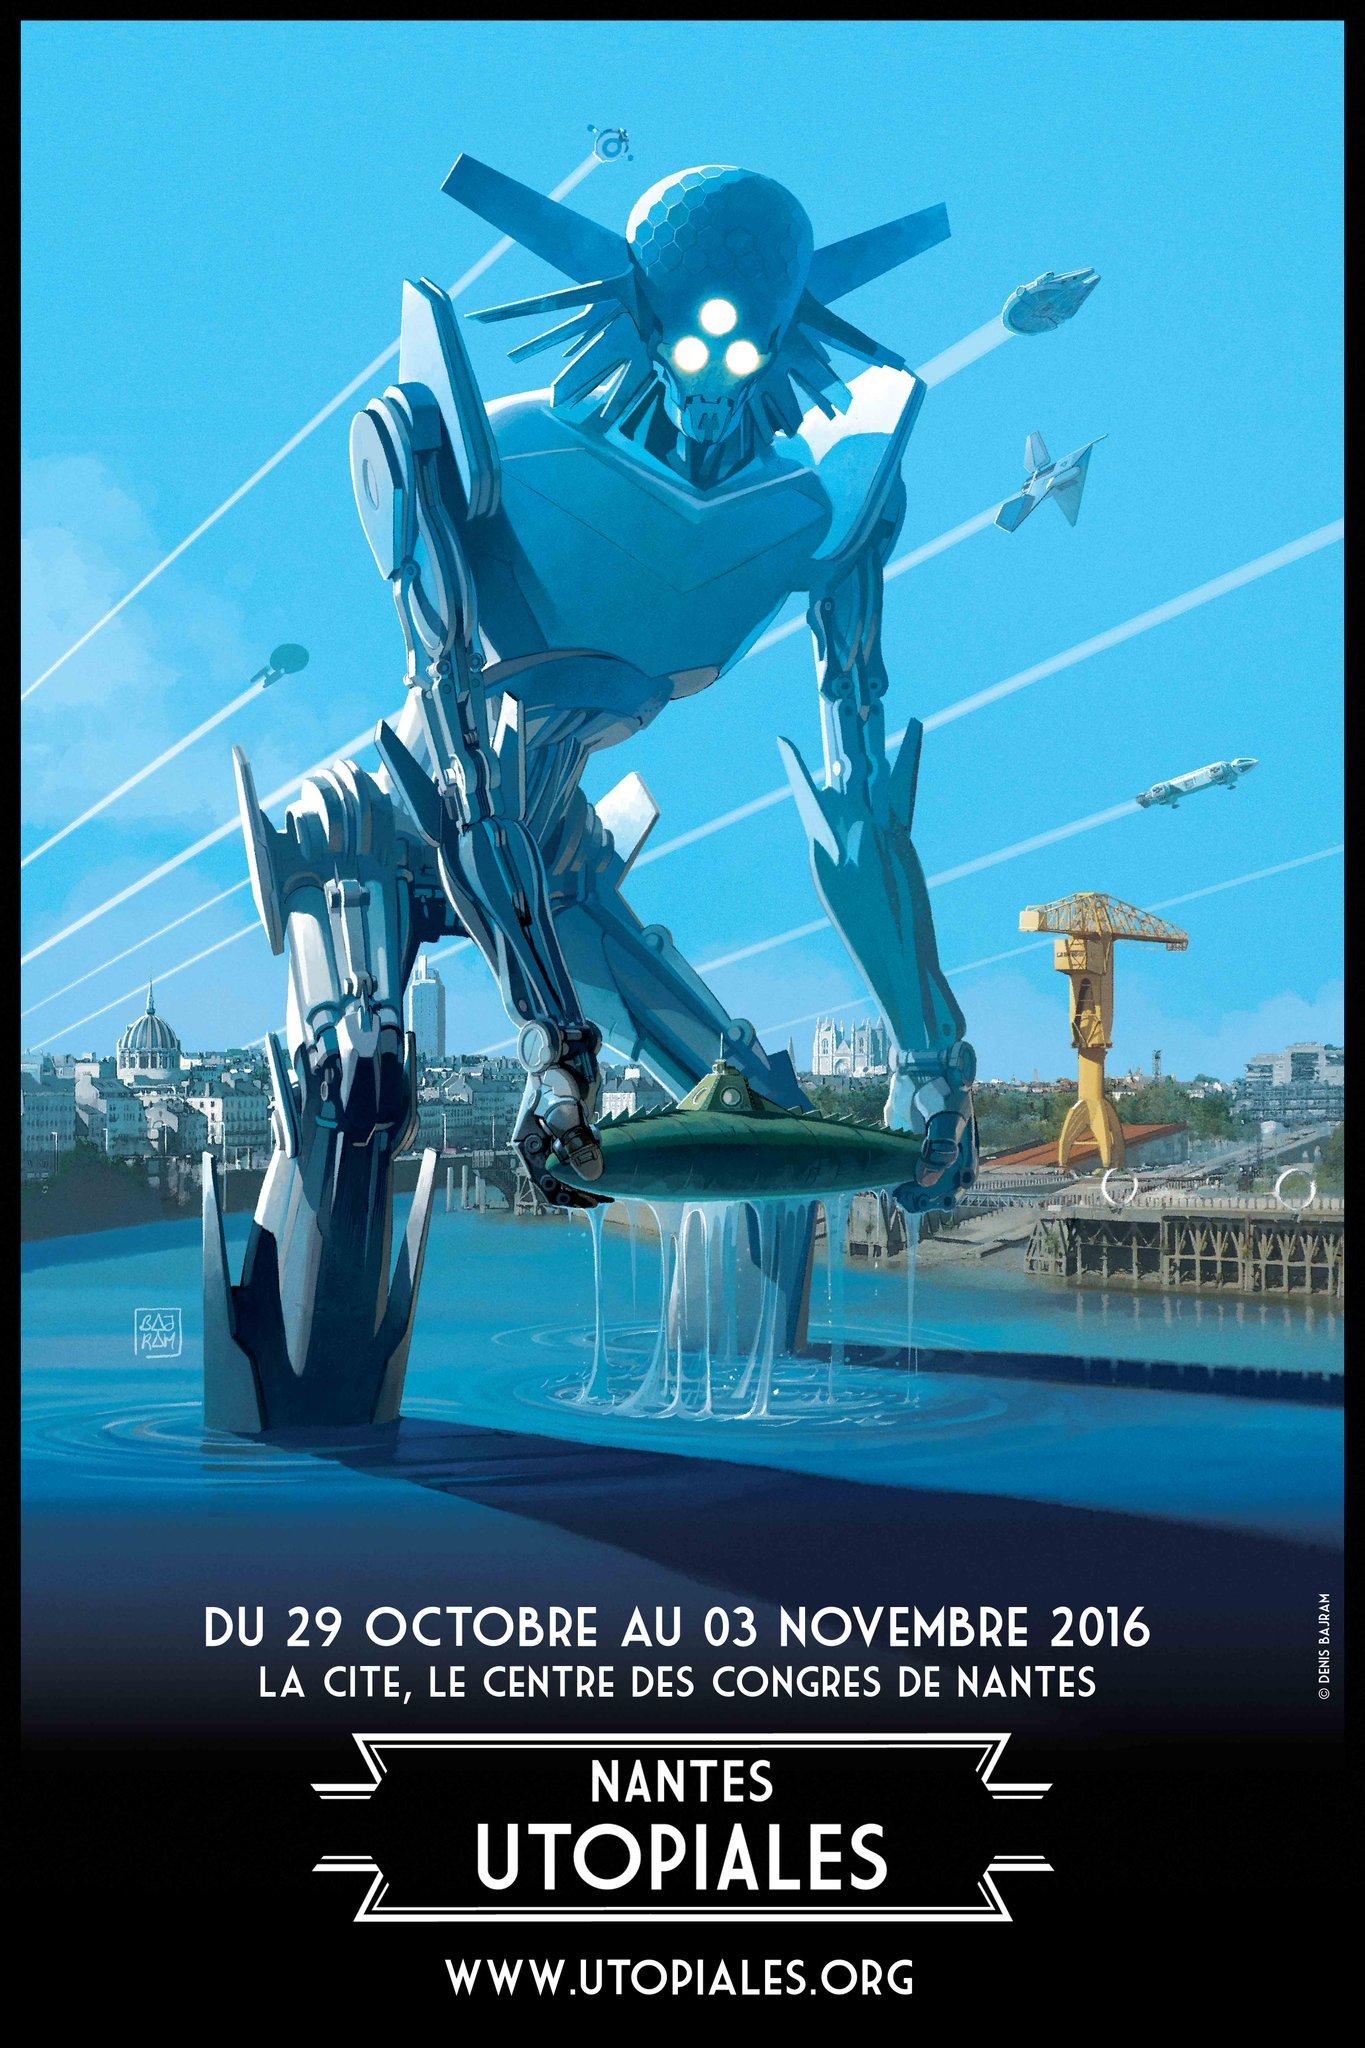 utopiales-2016-affiche